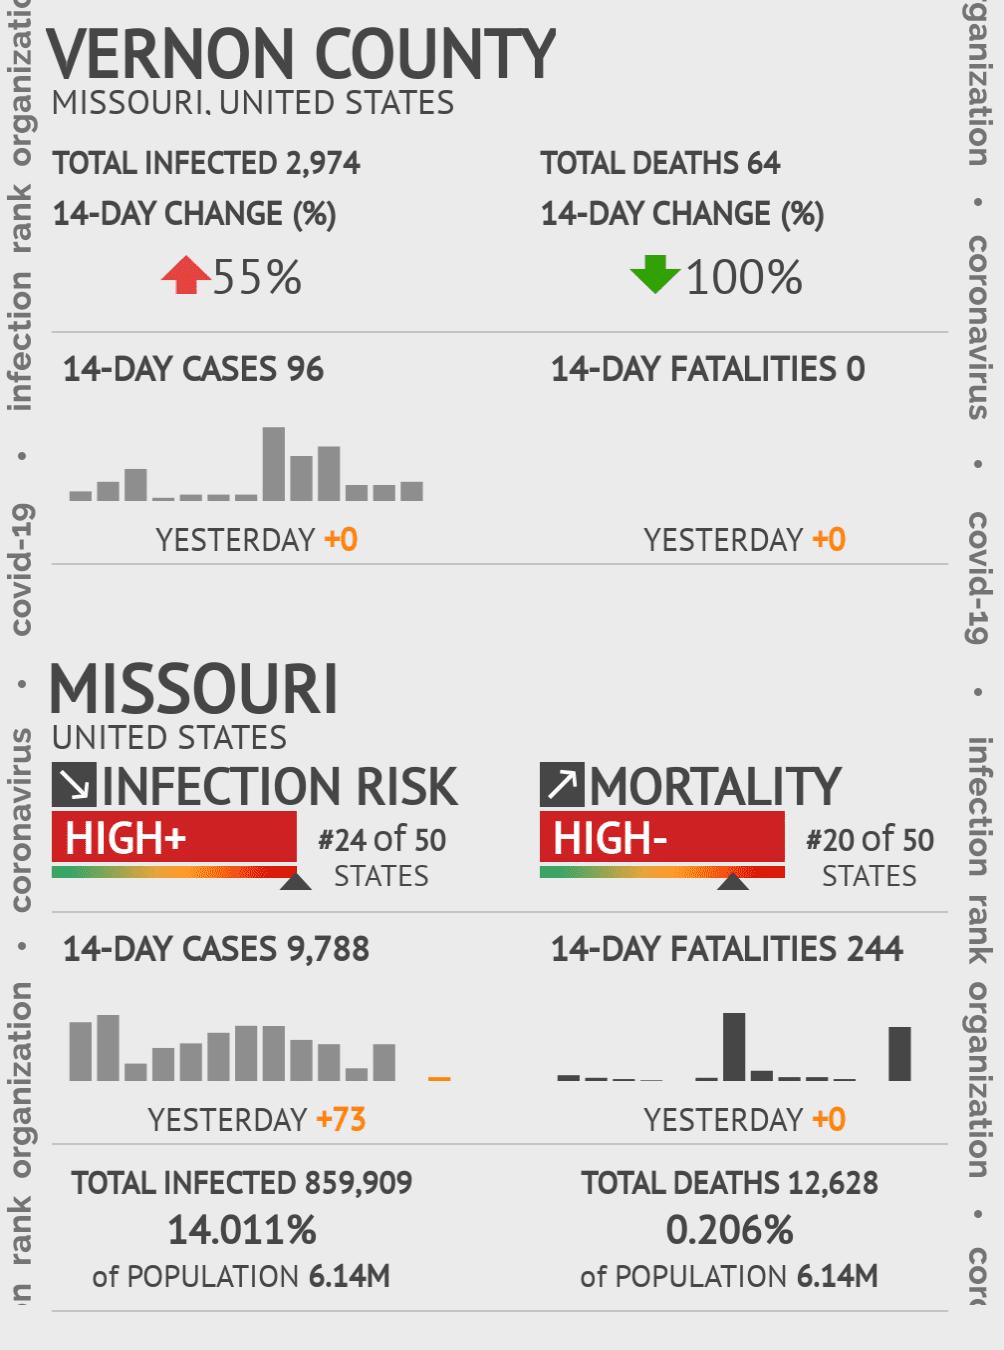 Vernon County Coronavirus Covid-19 Risk of Infection on July 24, 2021